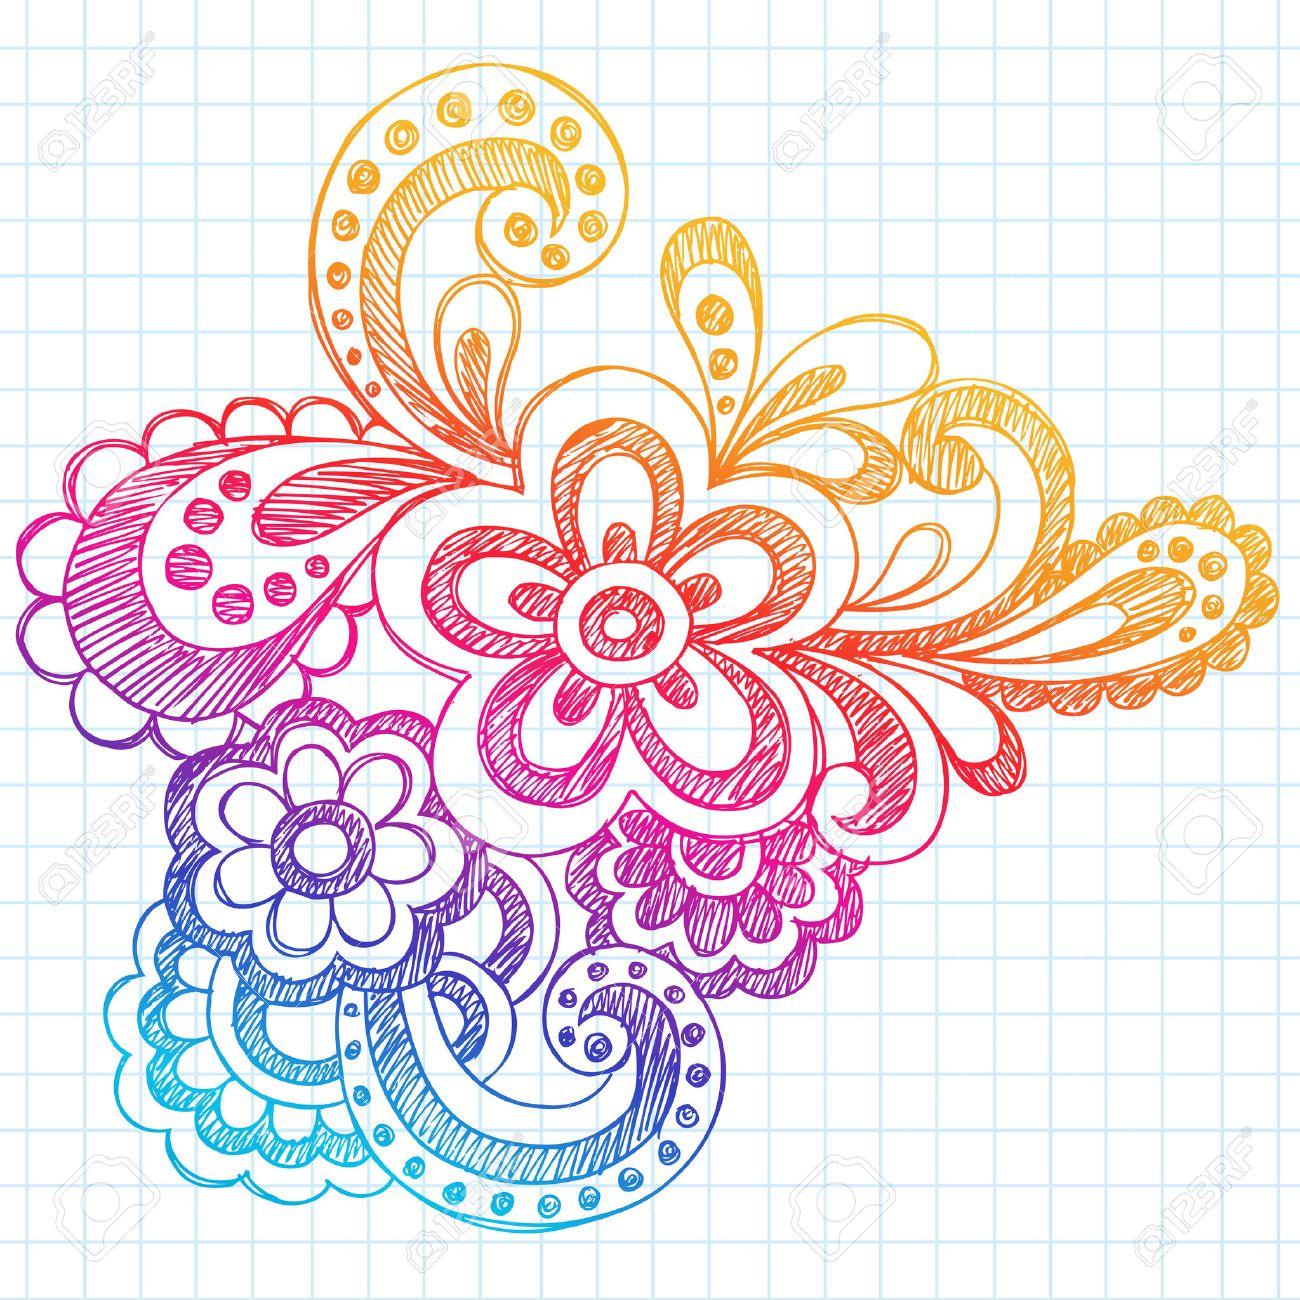 Hand Drawn Sketchy Abstract Paisley Henna Mehndi Style Notebook